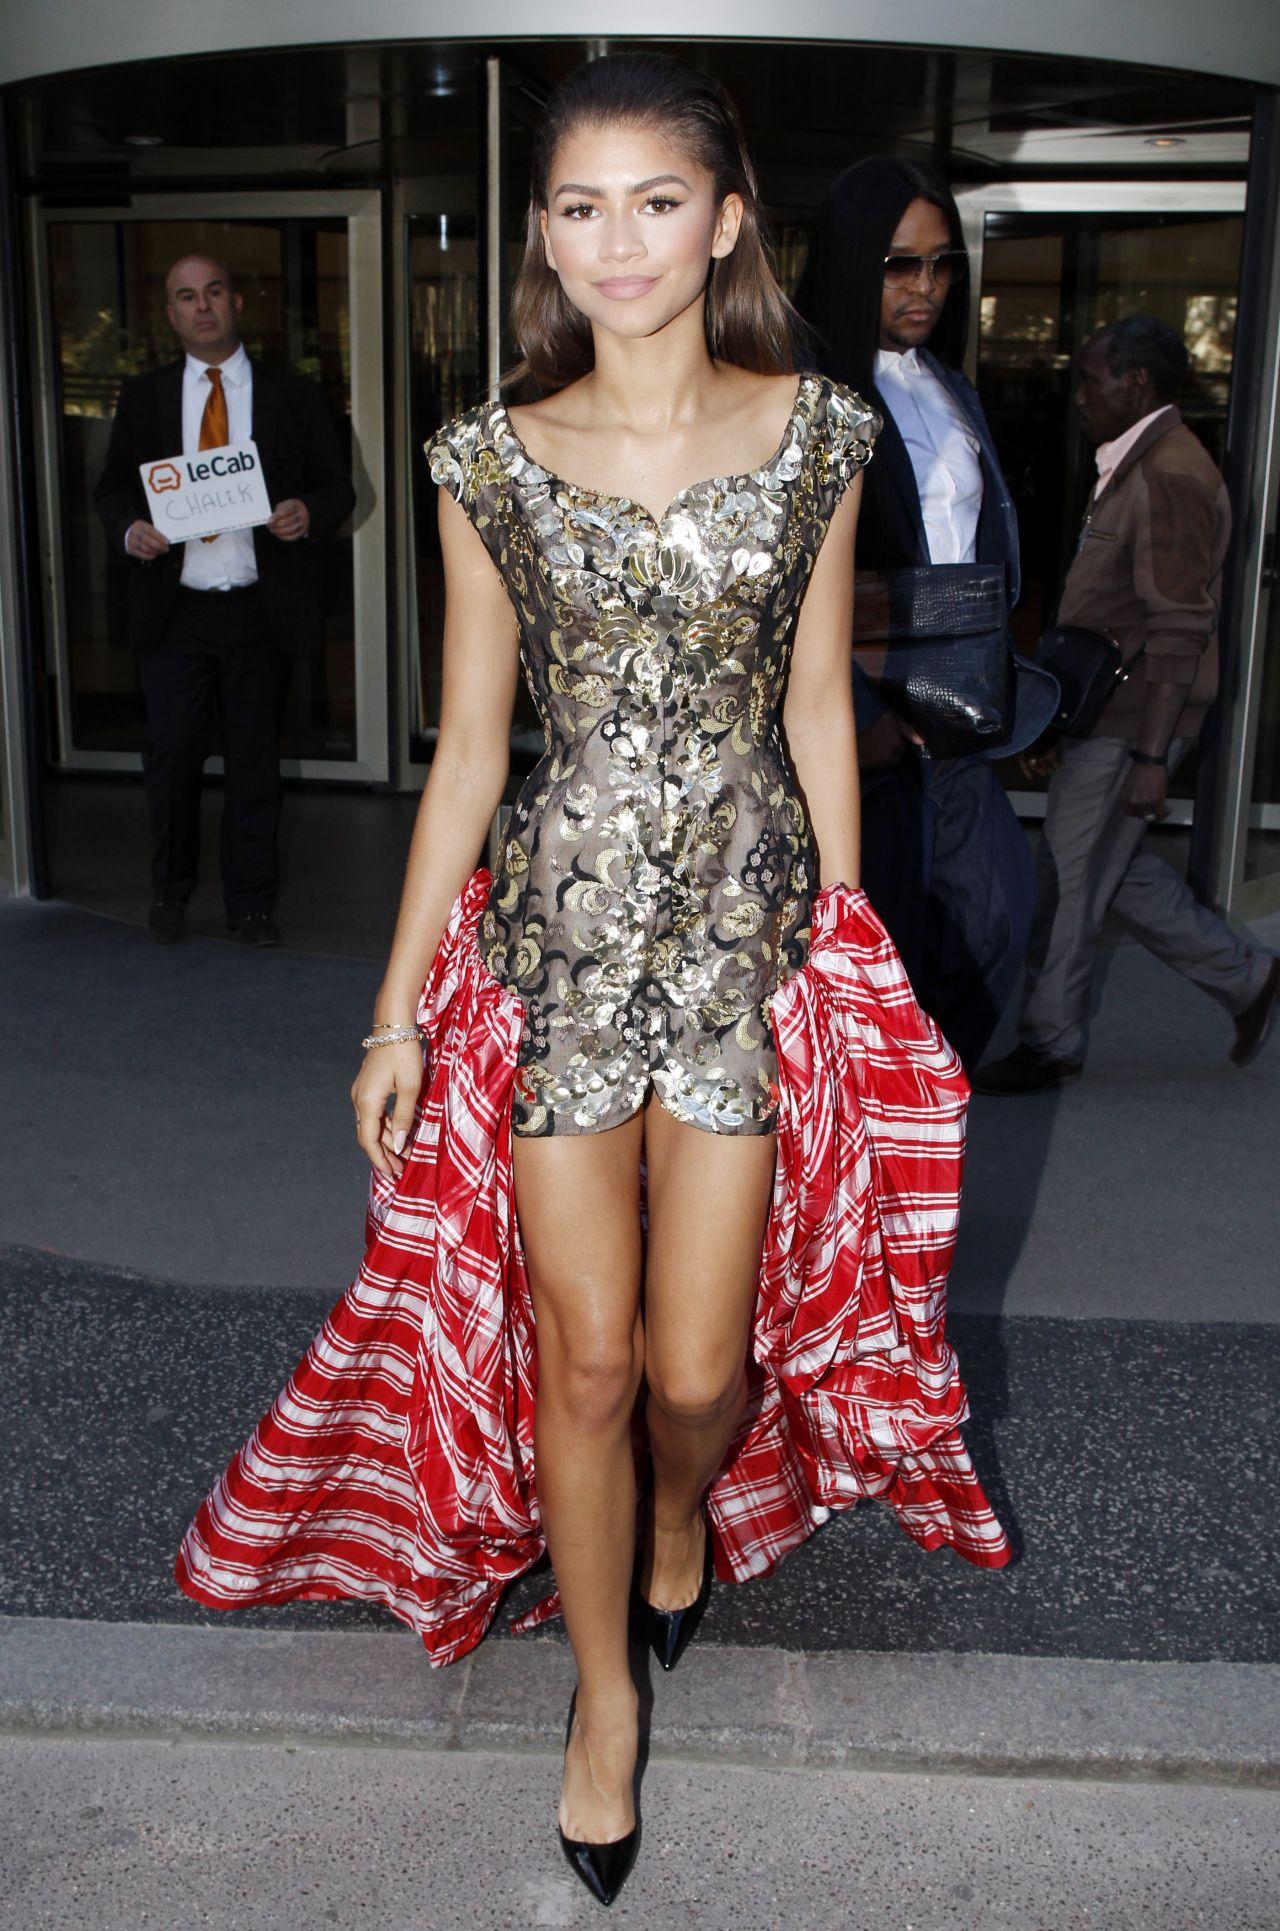 zendaya-arriving-at-vivienne-westwood-fashion-show-in-paris-october-2015_2